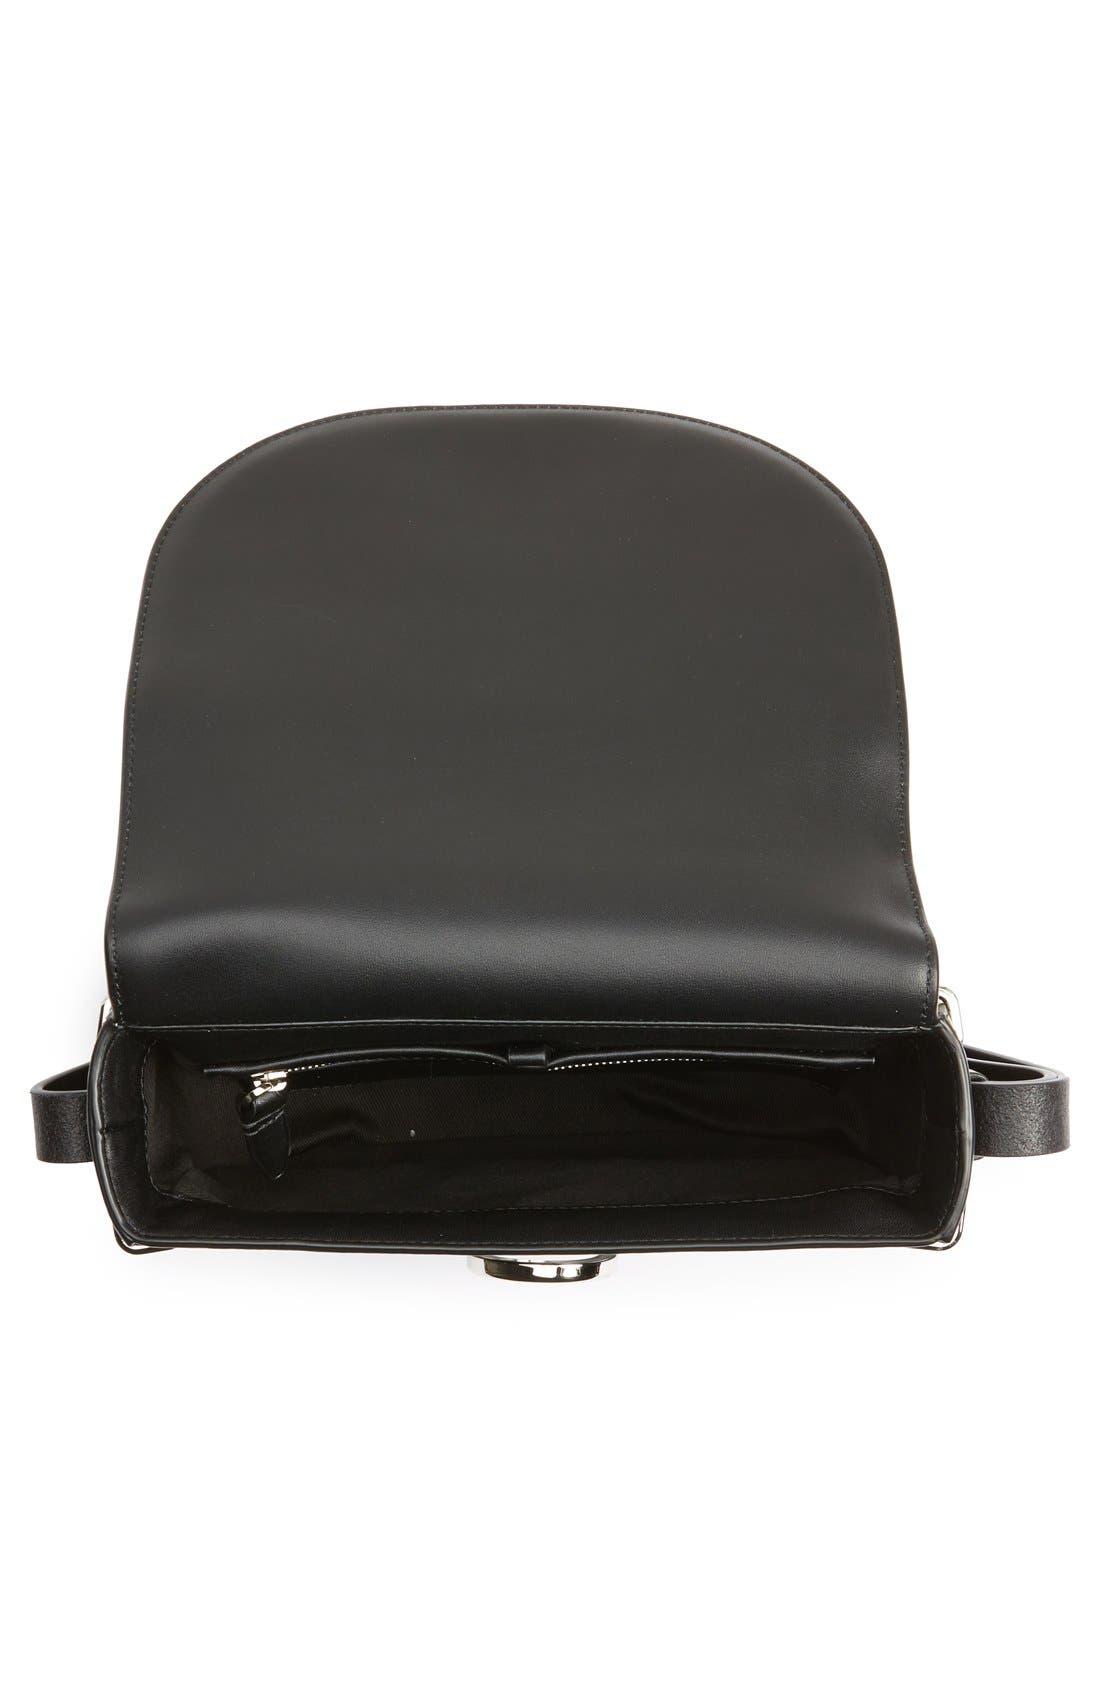 Alix Leather Saddle Bag,                             Alternate thumbnail 4, color,                             001